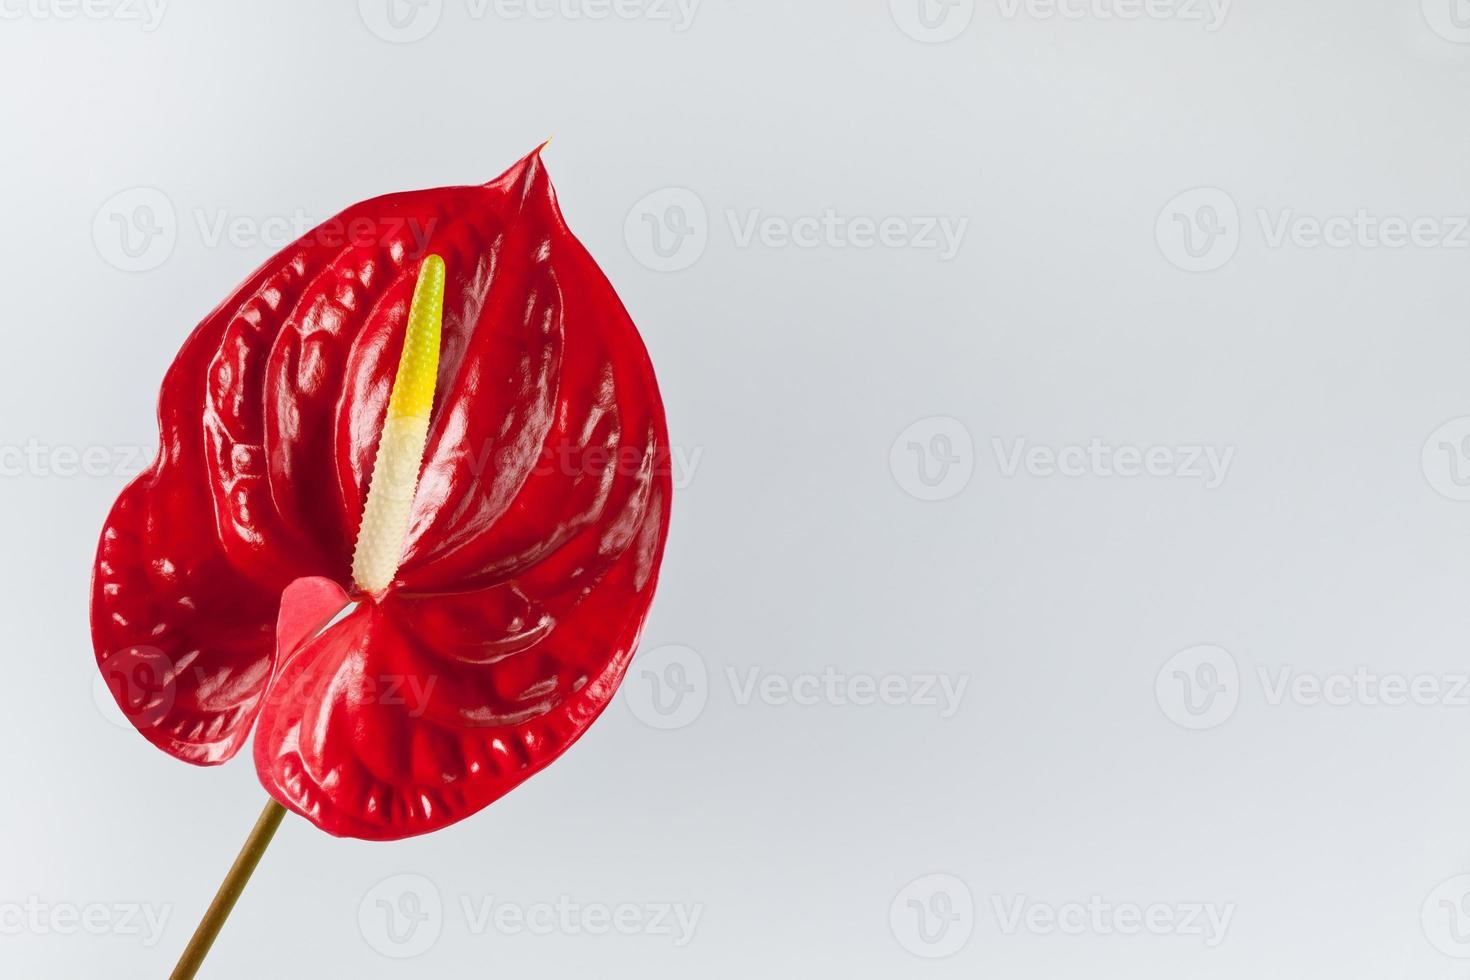 röd flamingo blomma foto